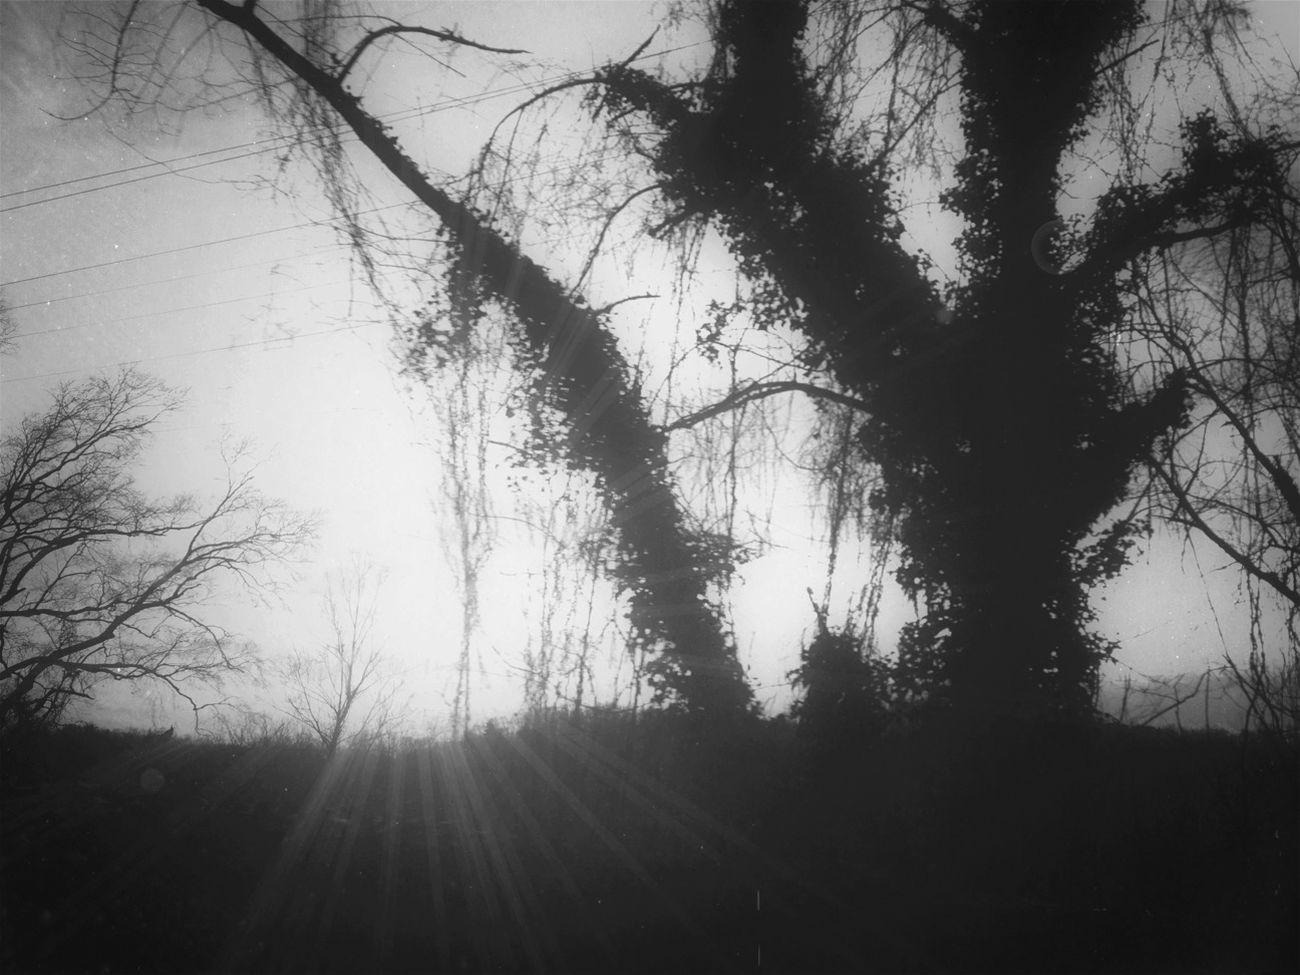 Blackandwhite Landscape Trees